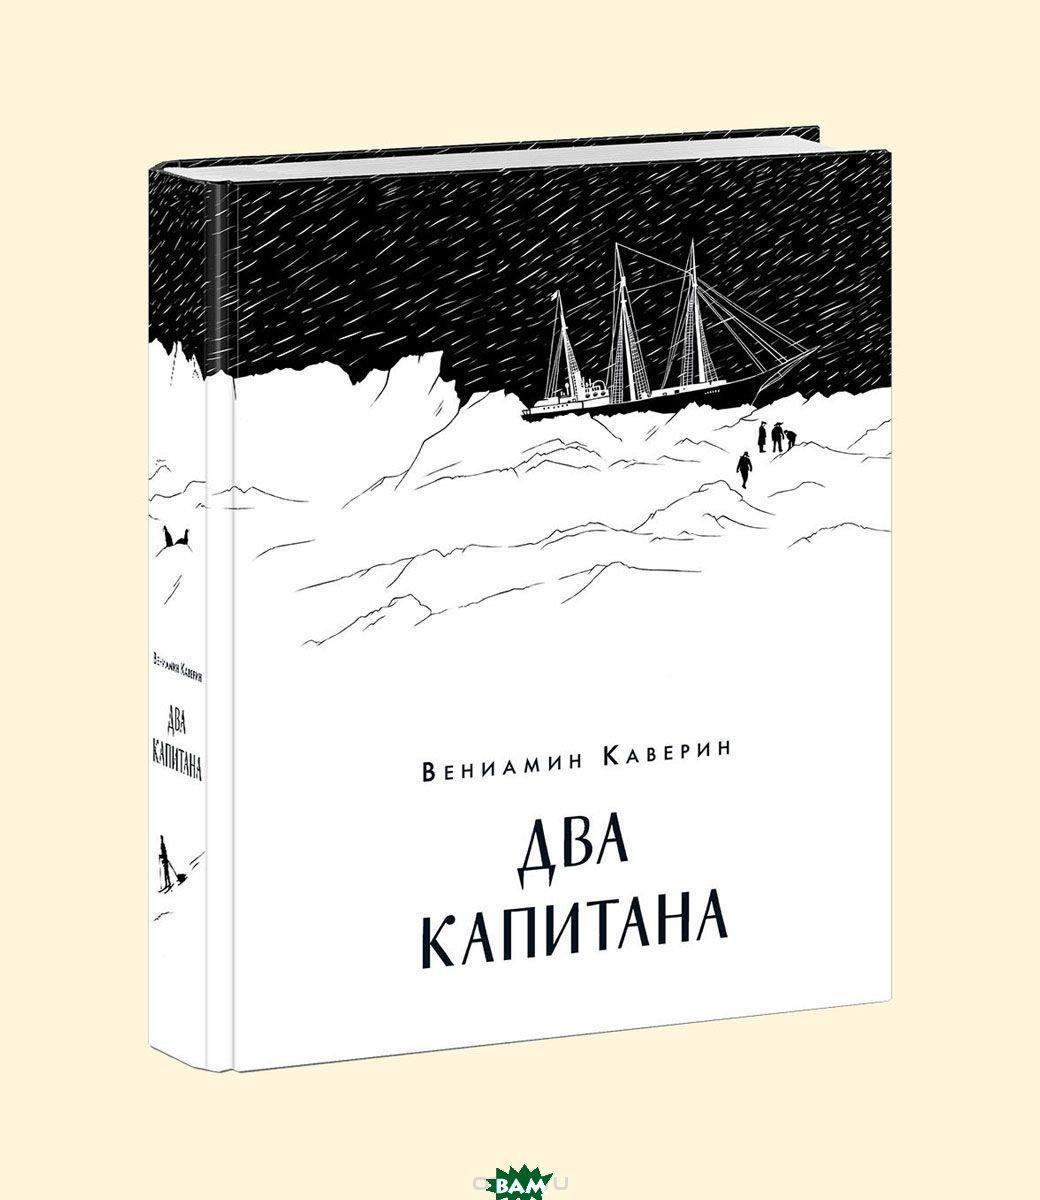 Купить Два капитана, НИГМА, Каверин Вениамин Александрович, 978-5-4335-0559-9